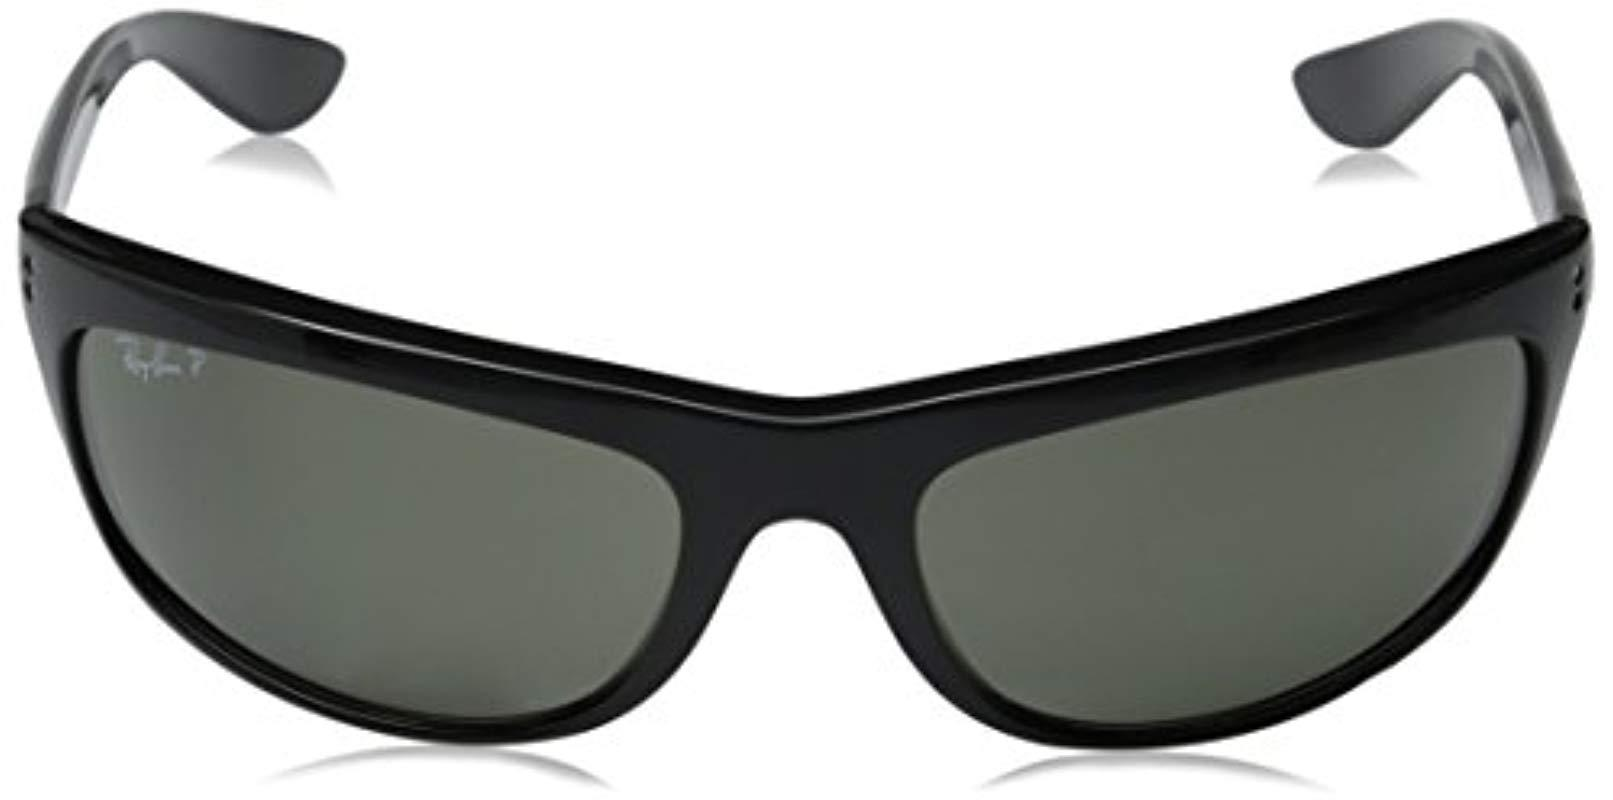 77bc9ab5db Ray-Ban - Sunglasses - Rb4089 Baloram Frame  Black Lens  Crystal Green  Polarized. View fullscreen